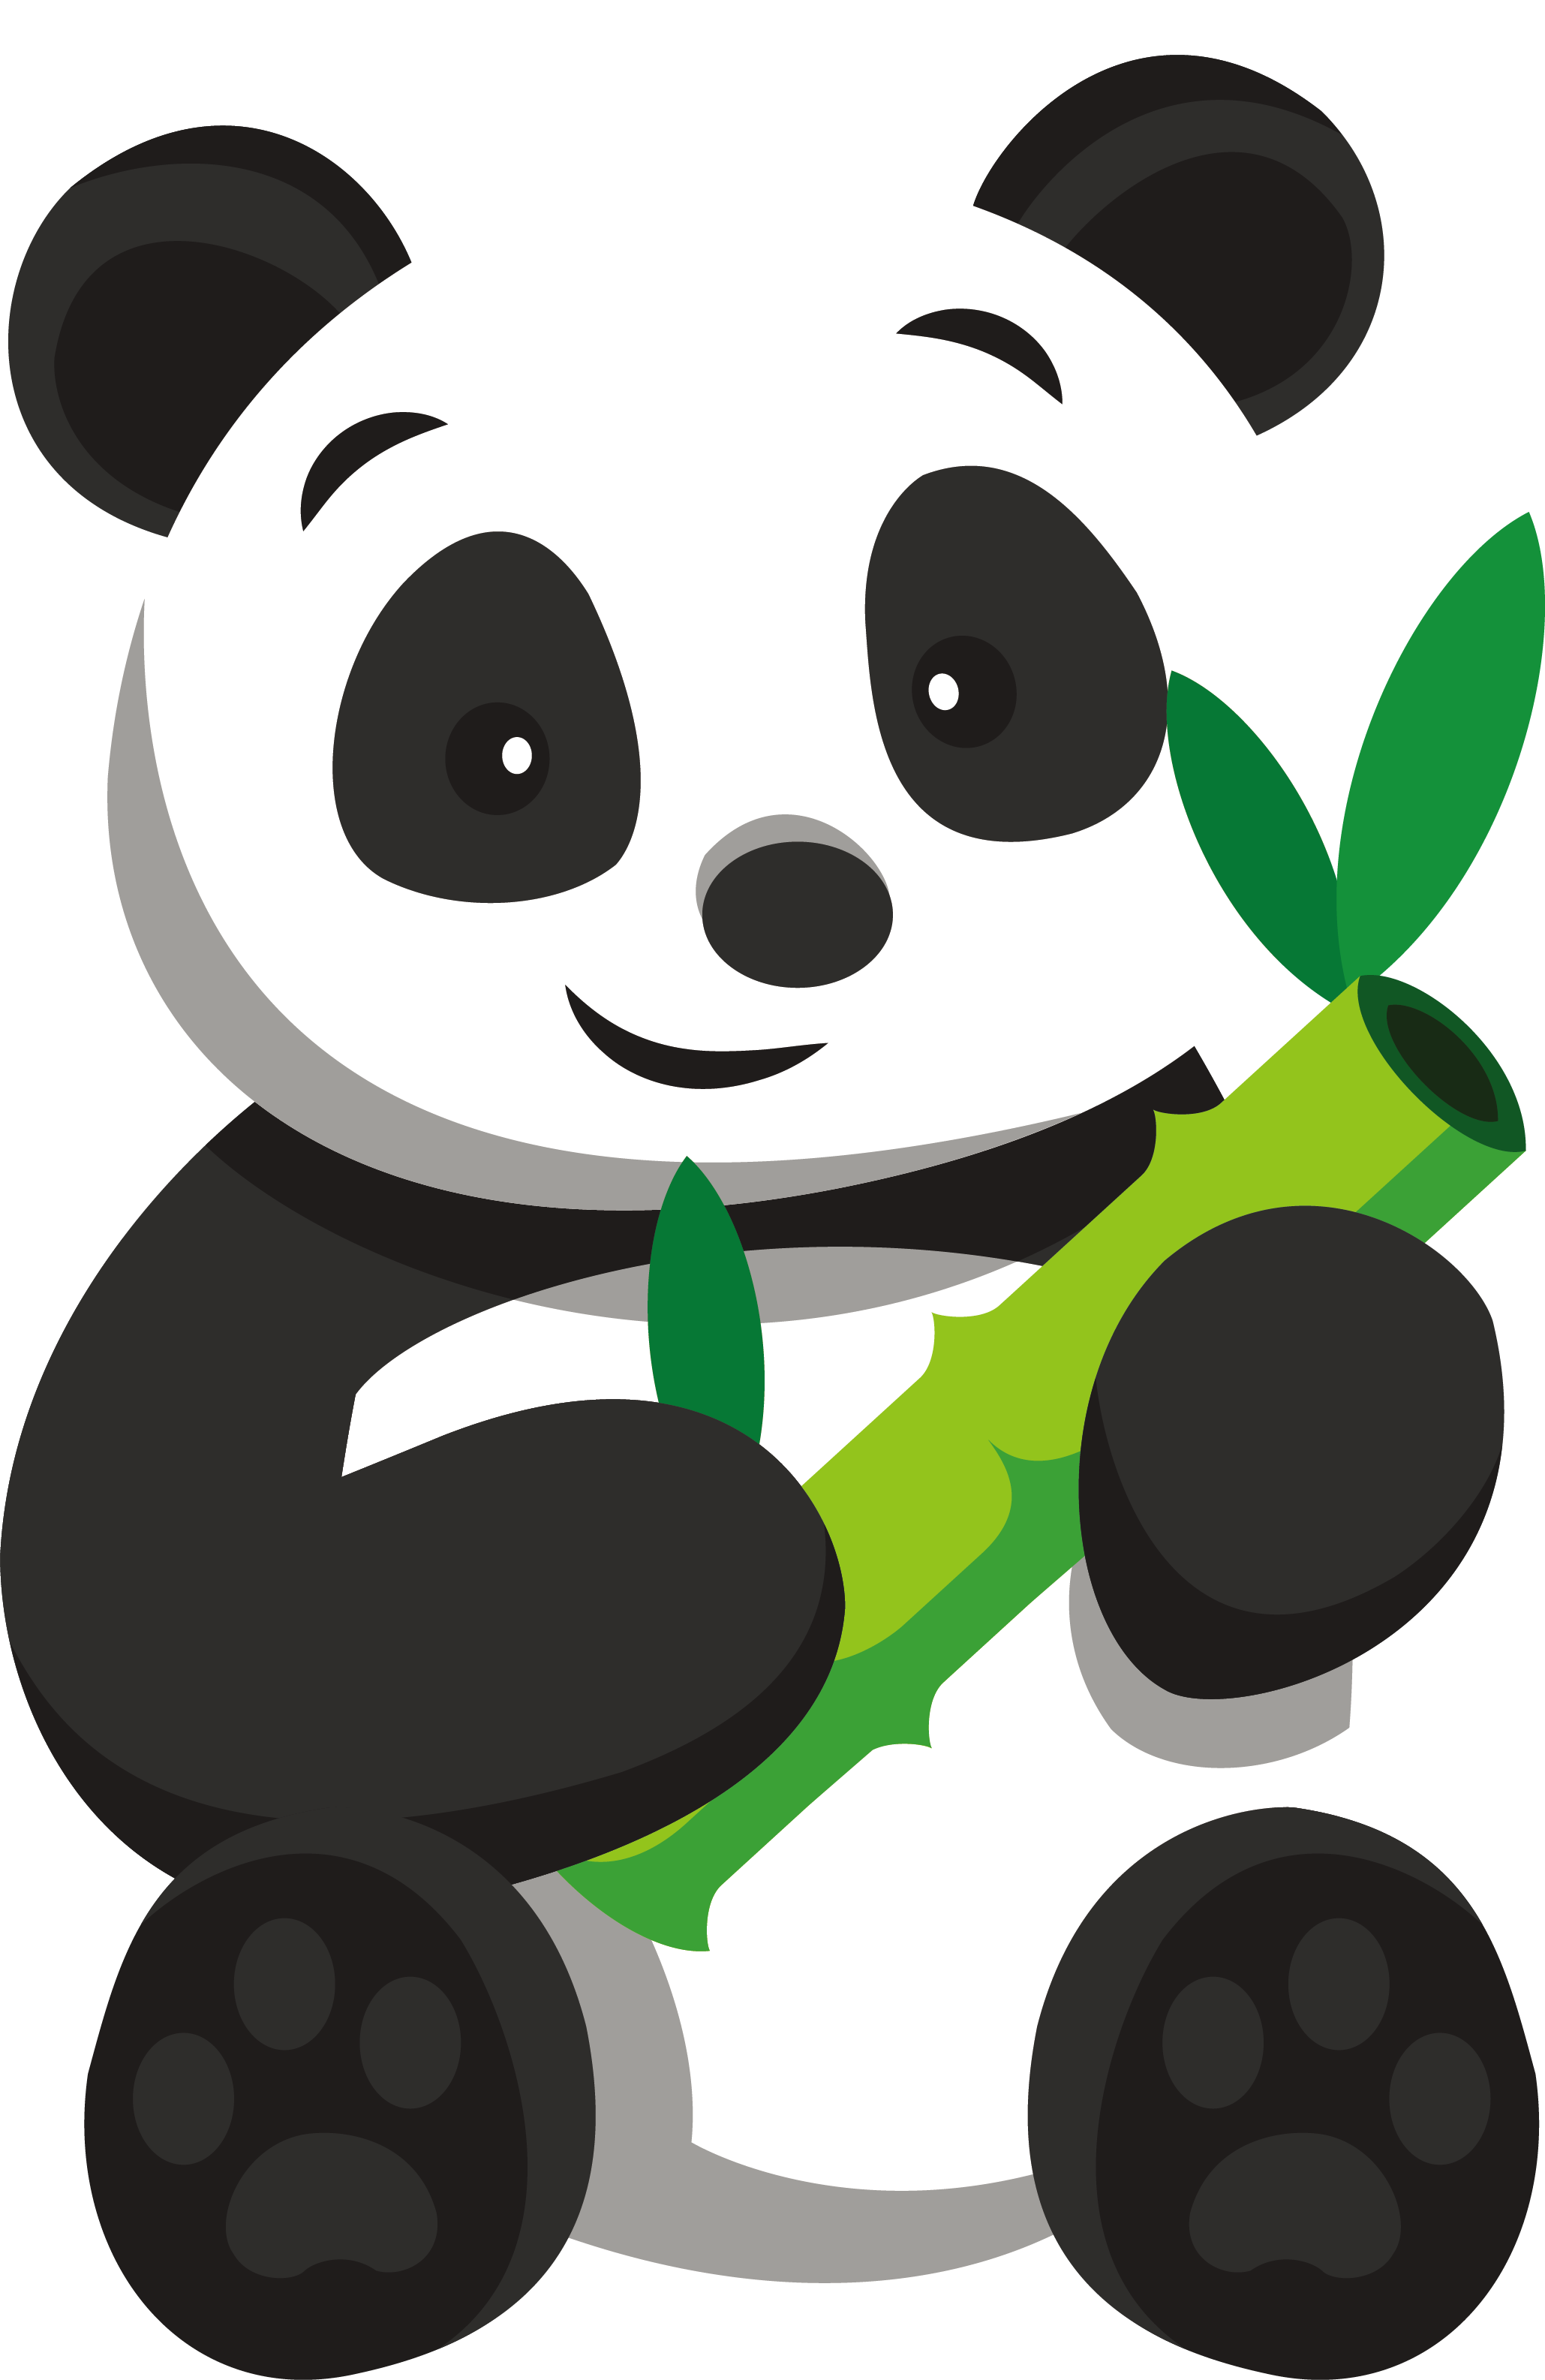 Bamboo tree clipart jpg transparent download Giant panda Panda House restaurant Bear Clip art - Bamboo Panda 2059 ... jpg transparent download